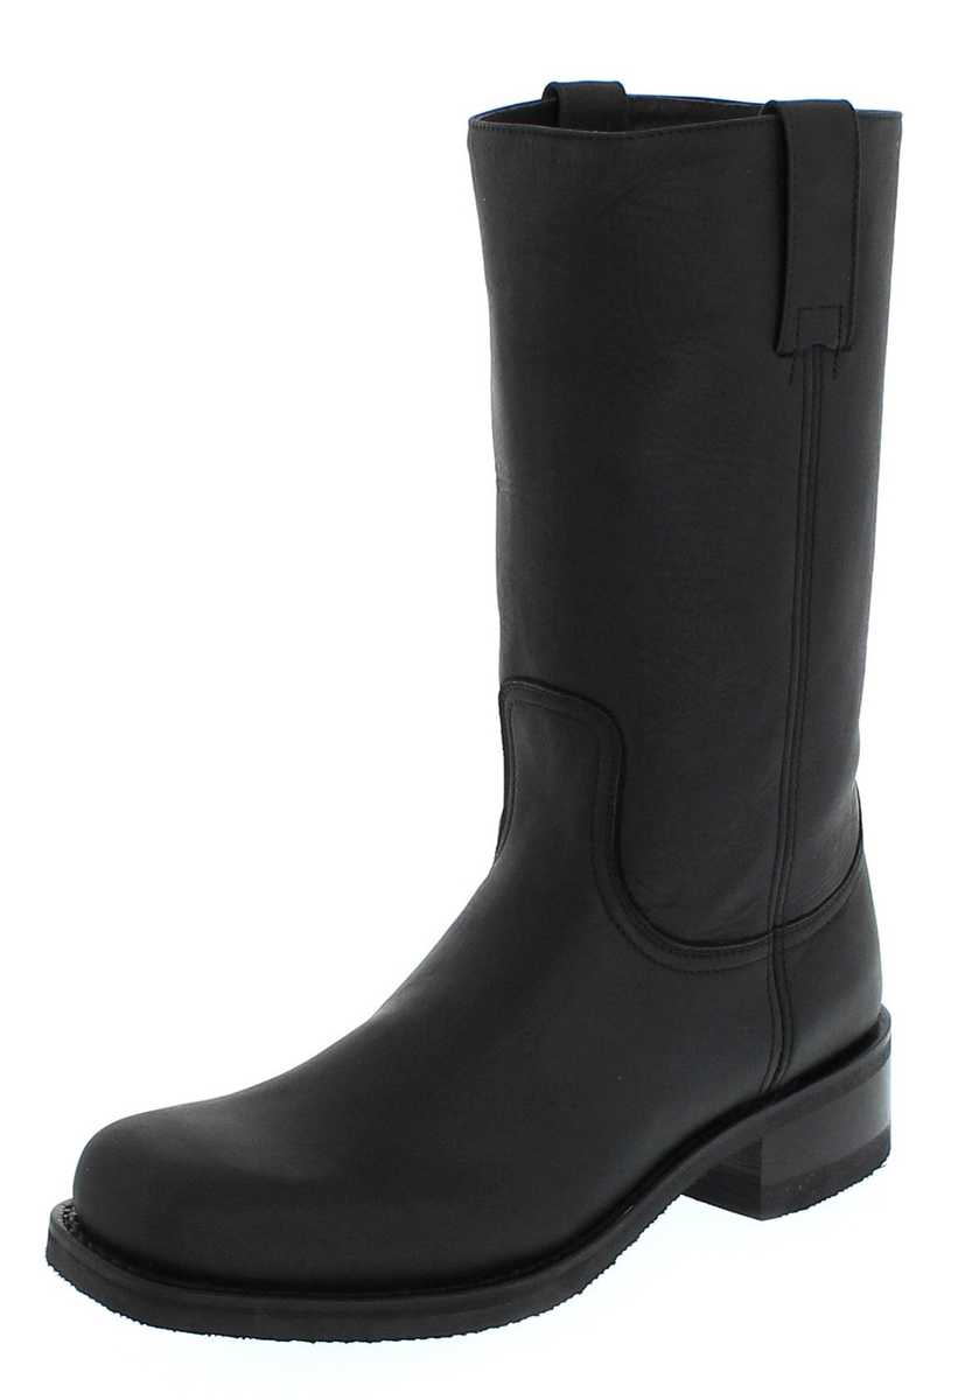 Sendra Boots 3162 Loren Negro Farm & Ranch Stiefel - schwarz